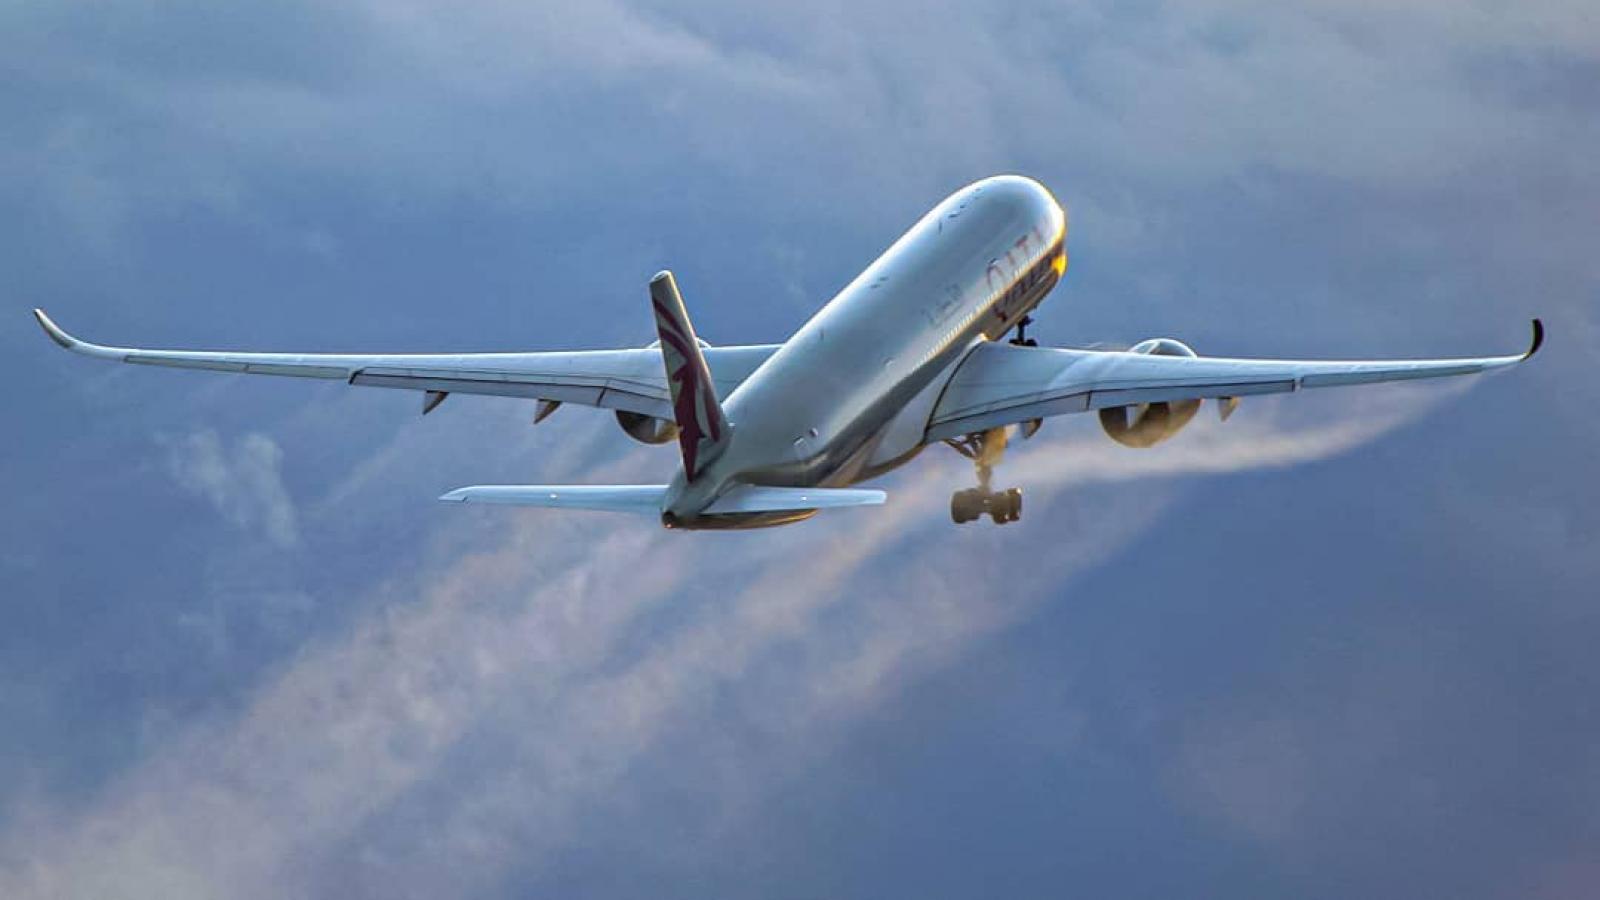 Qatar Airways allows flexibility to change travel plans